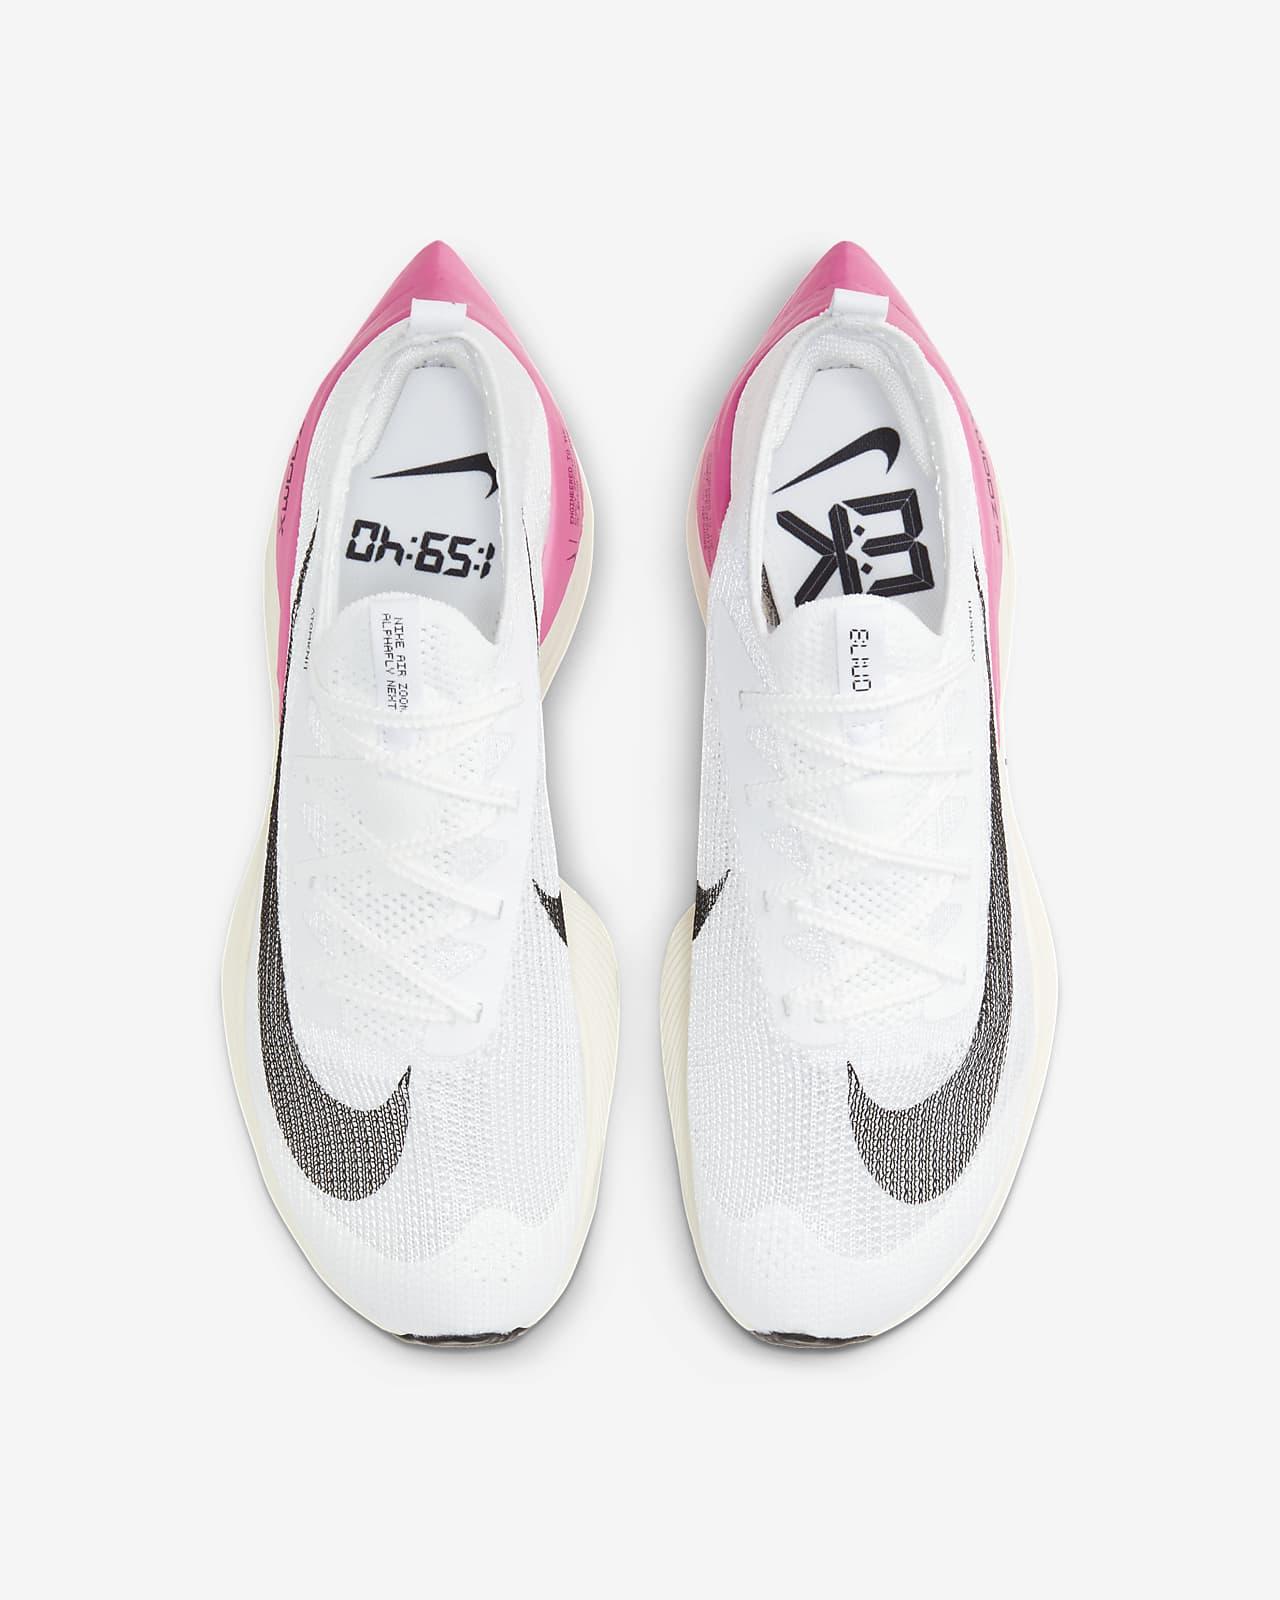 Nike Air Zoom Alphafly Next% Eliud